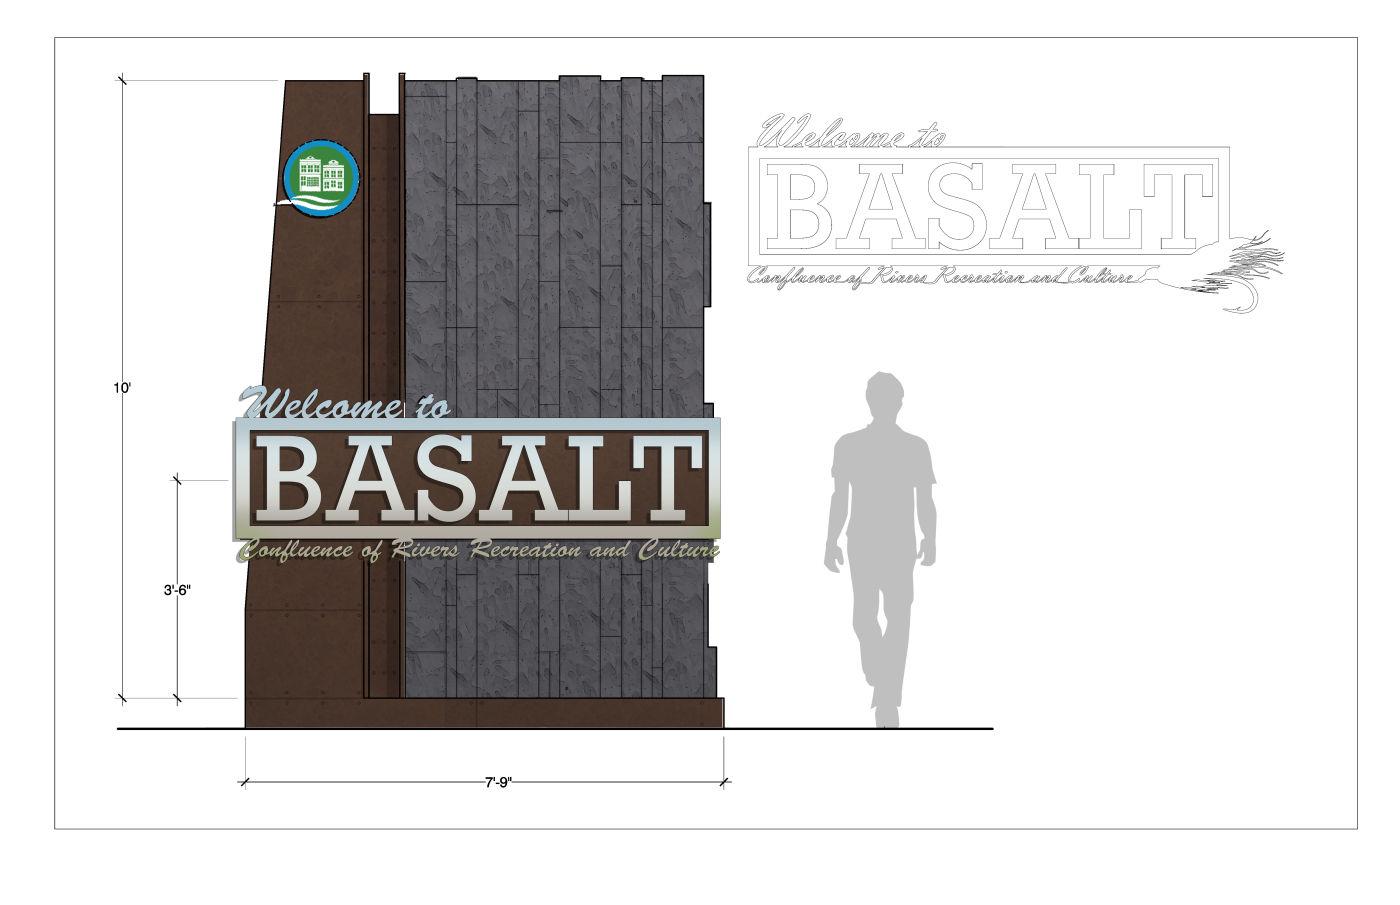 Basalt Monument DD 02-19-14